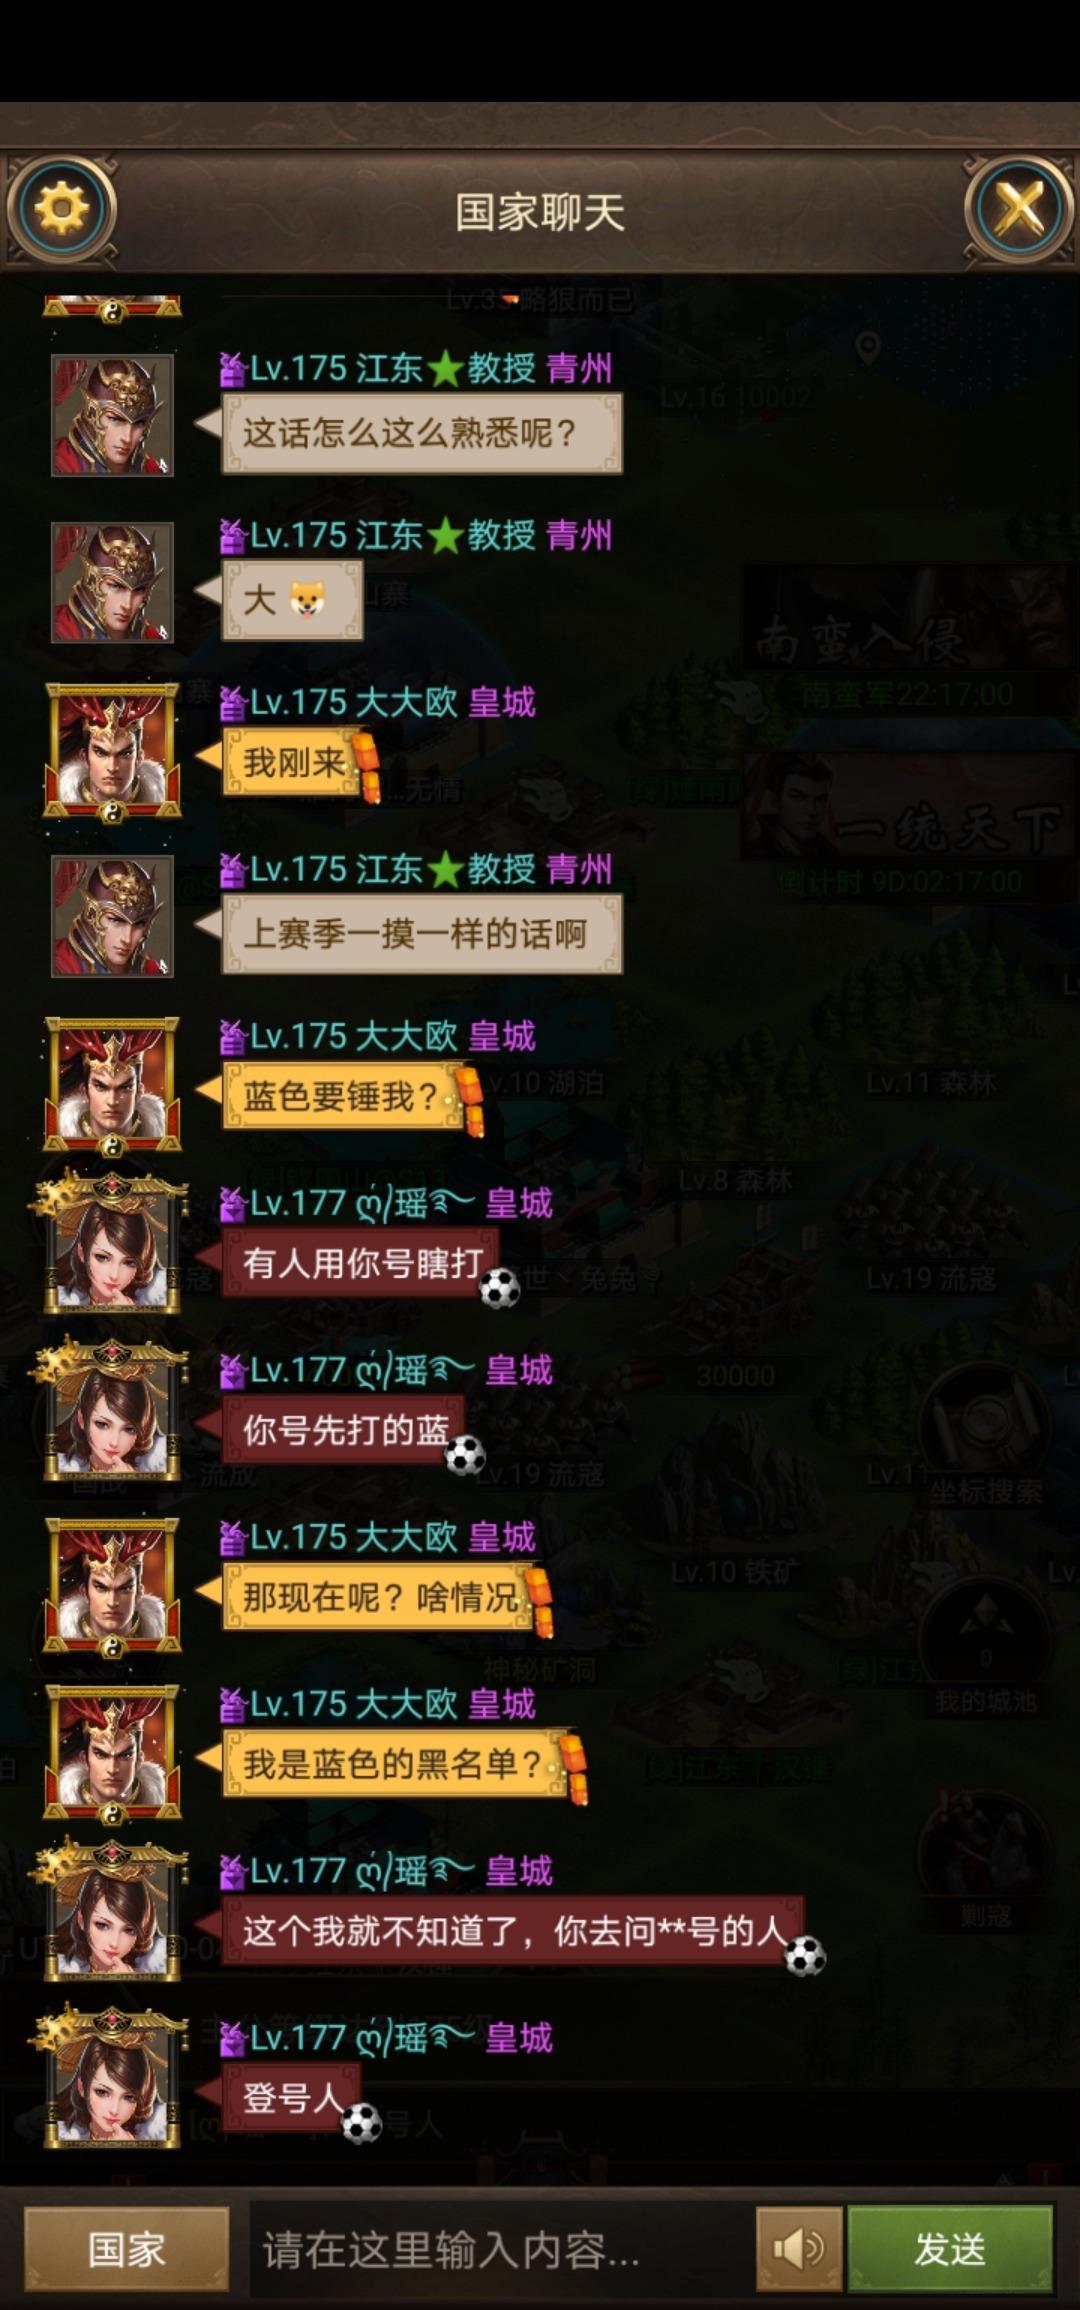 Screenshot_20200422_214301_com.jedigames.rxsg.luobo.jpg